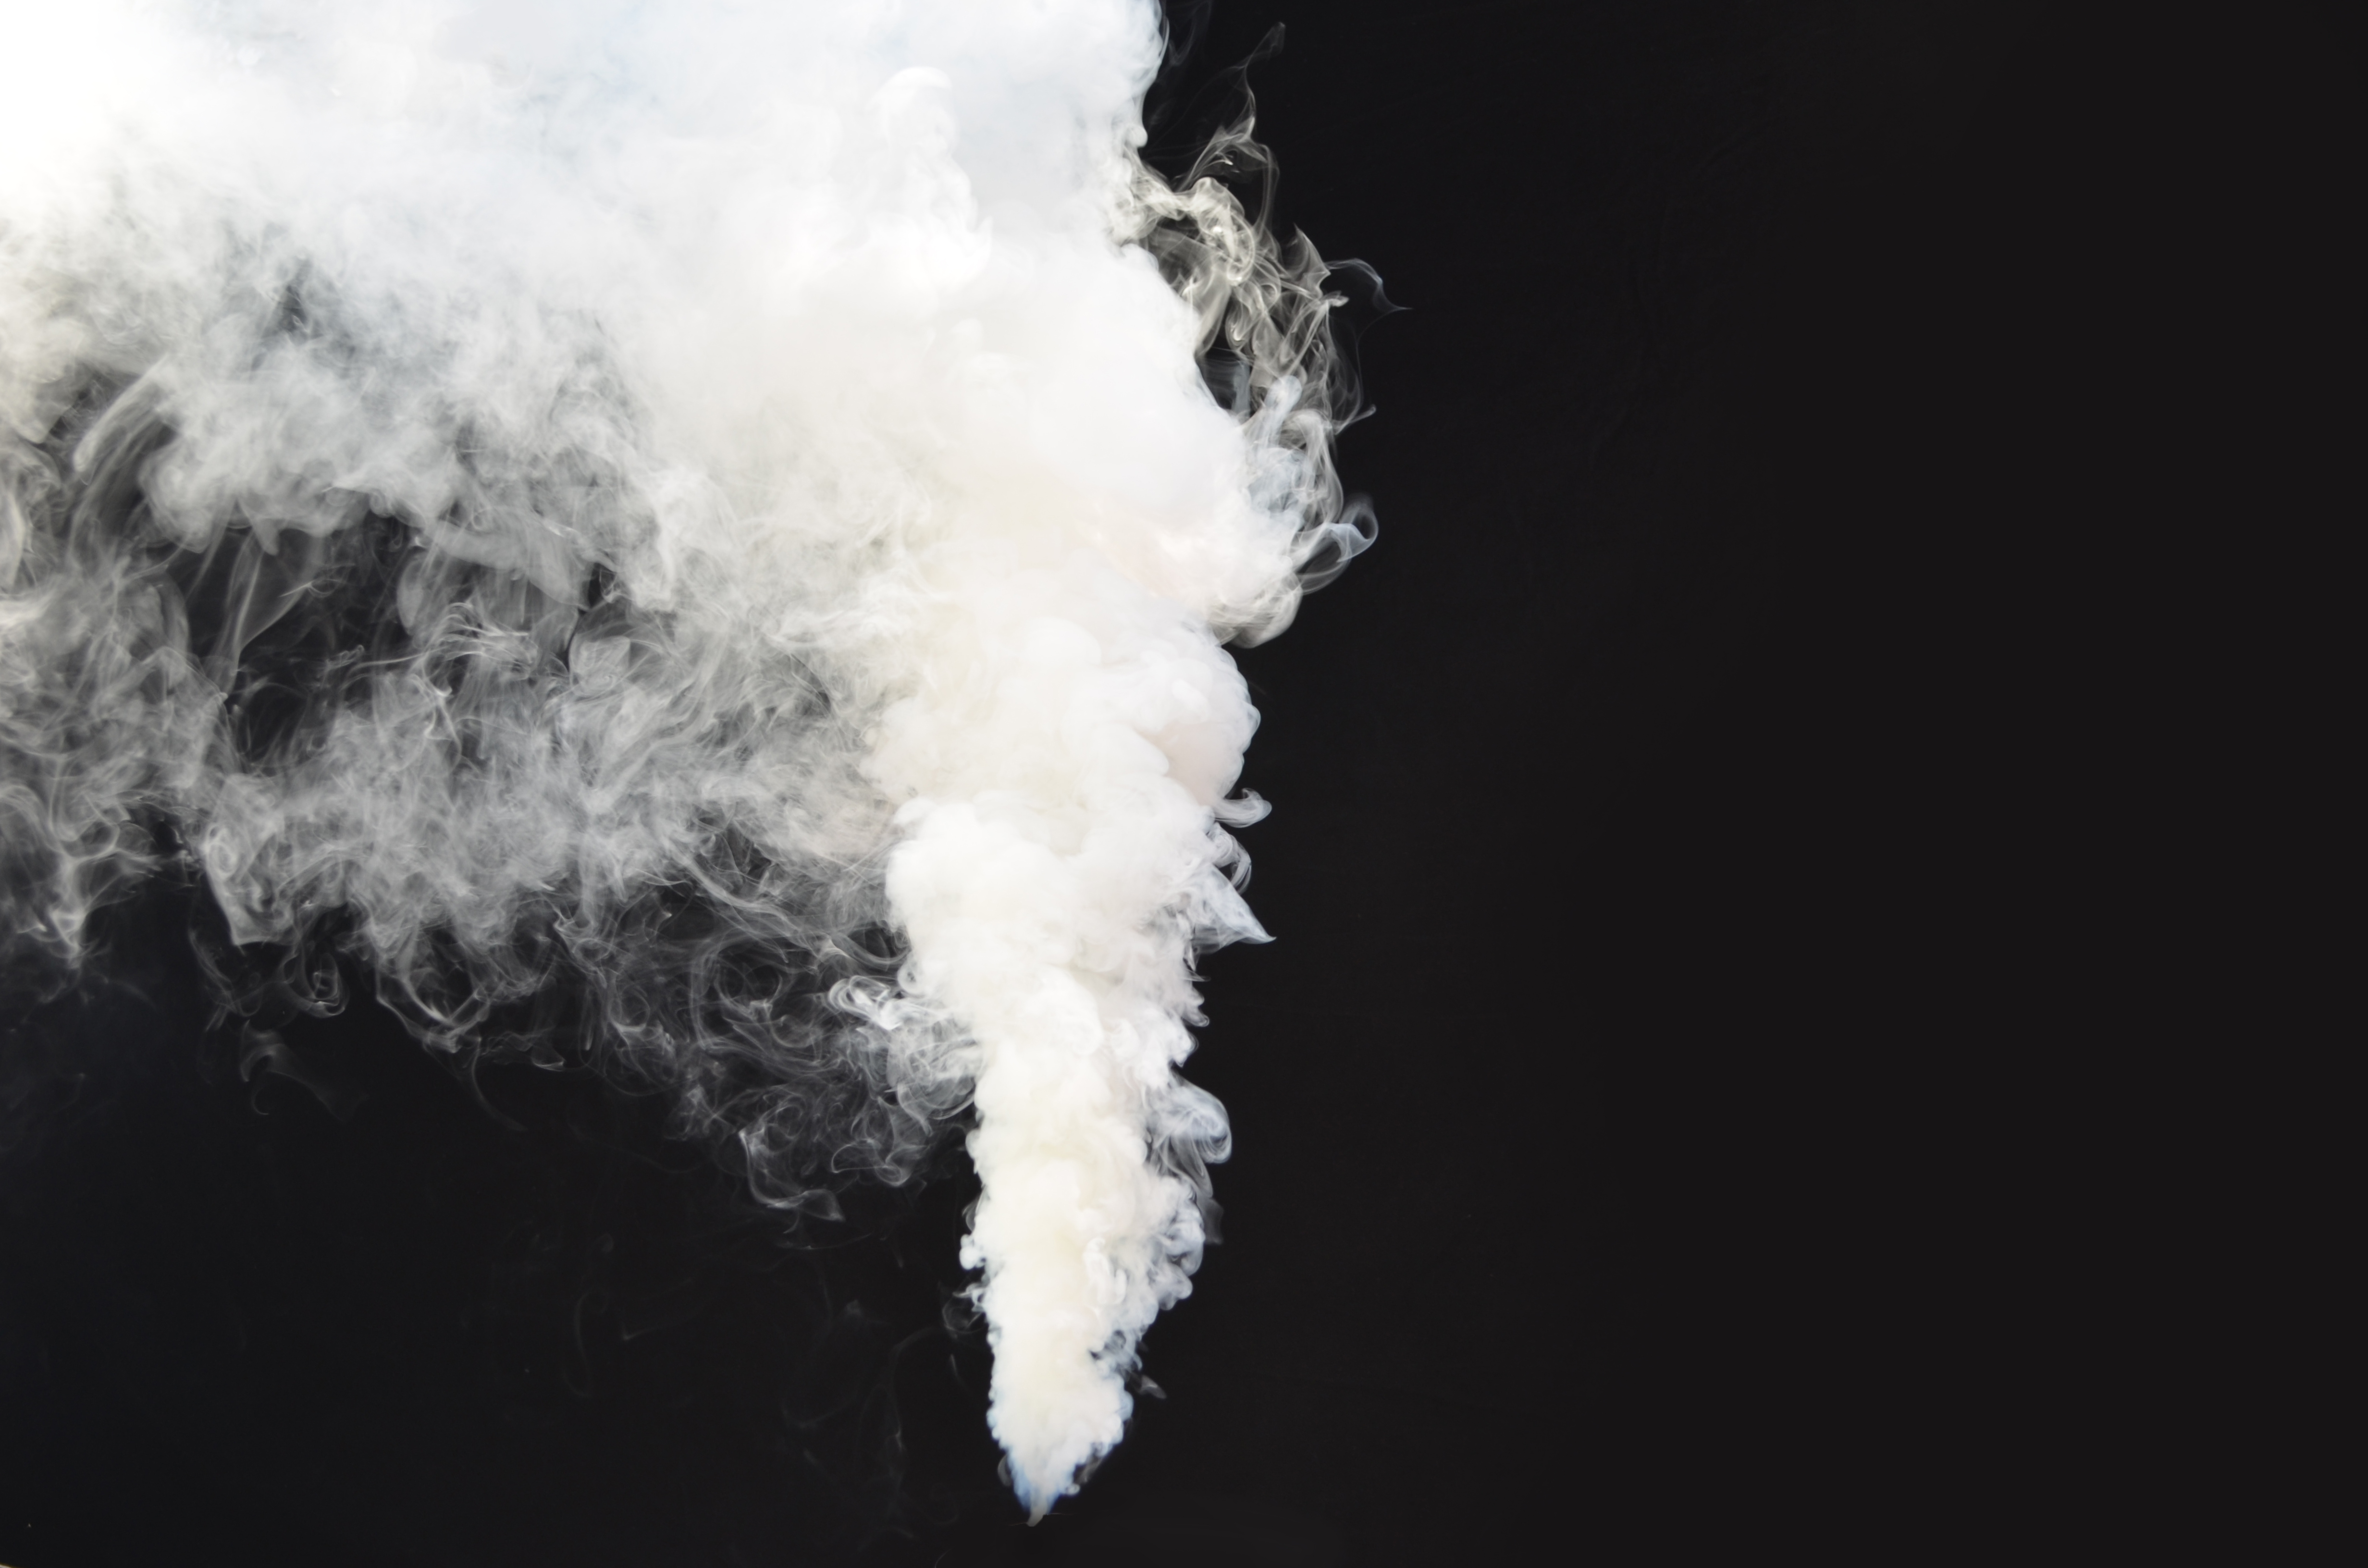 Smoke Bomb Smoke Stock 0011 White Plume By Annamae22 On Deviantart